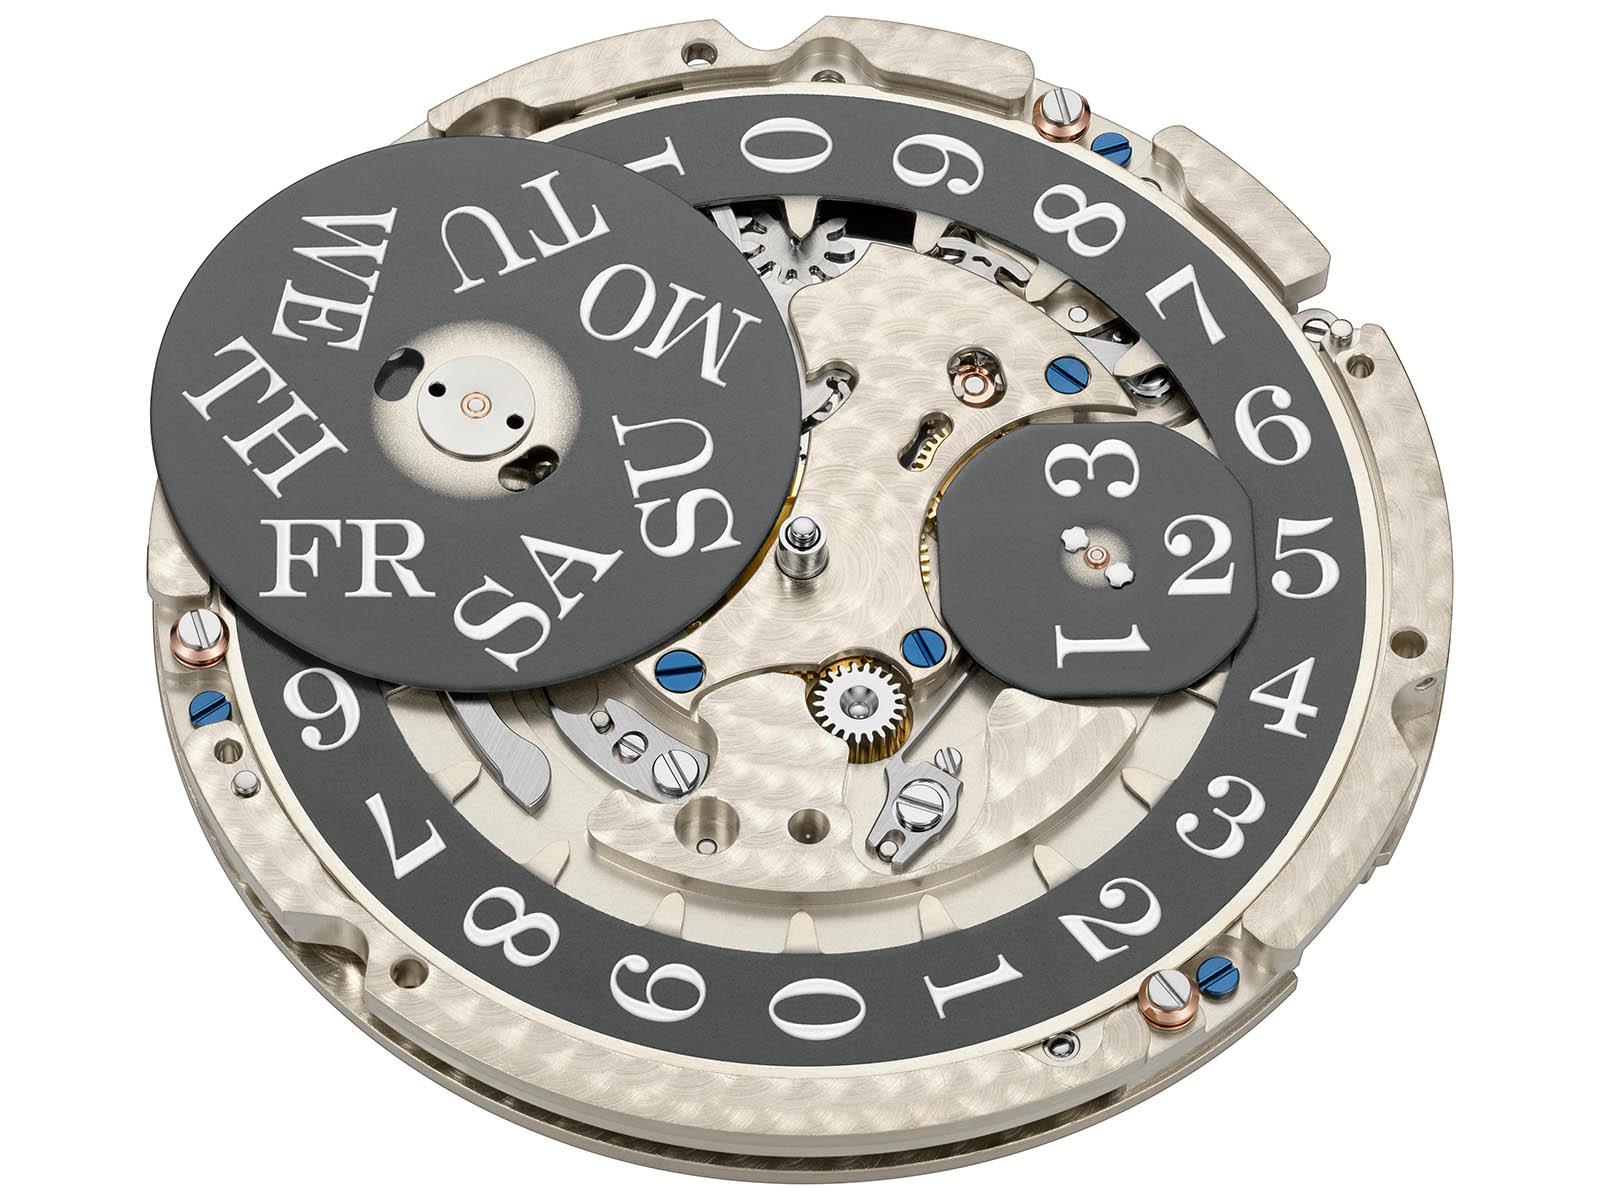 363-038-a-lange-sohne-odysseus-watch-wonders-2020-5.jpg